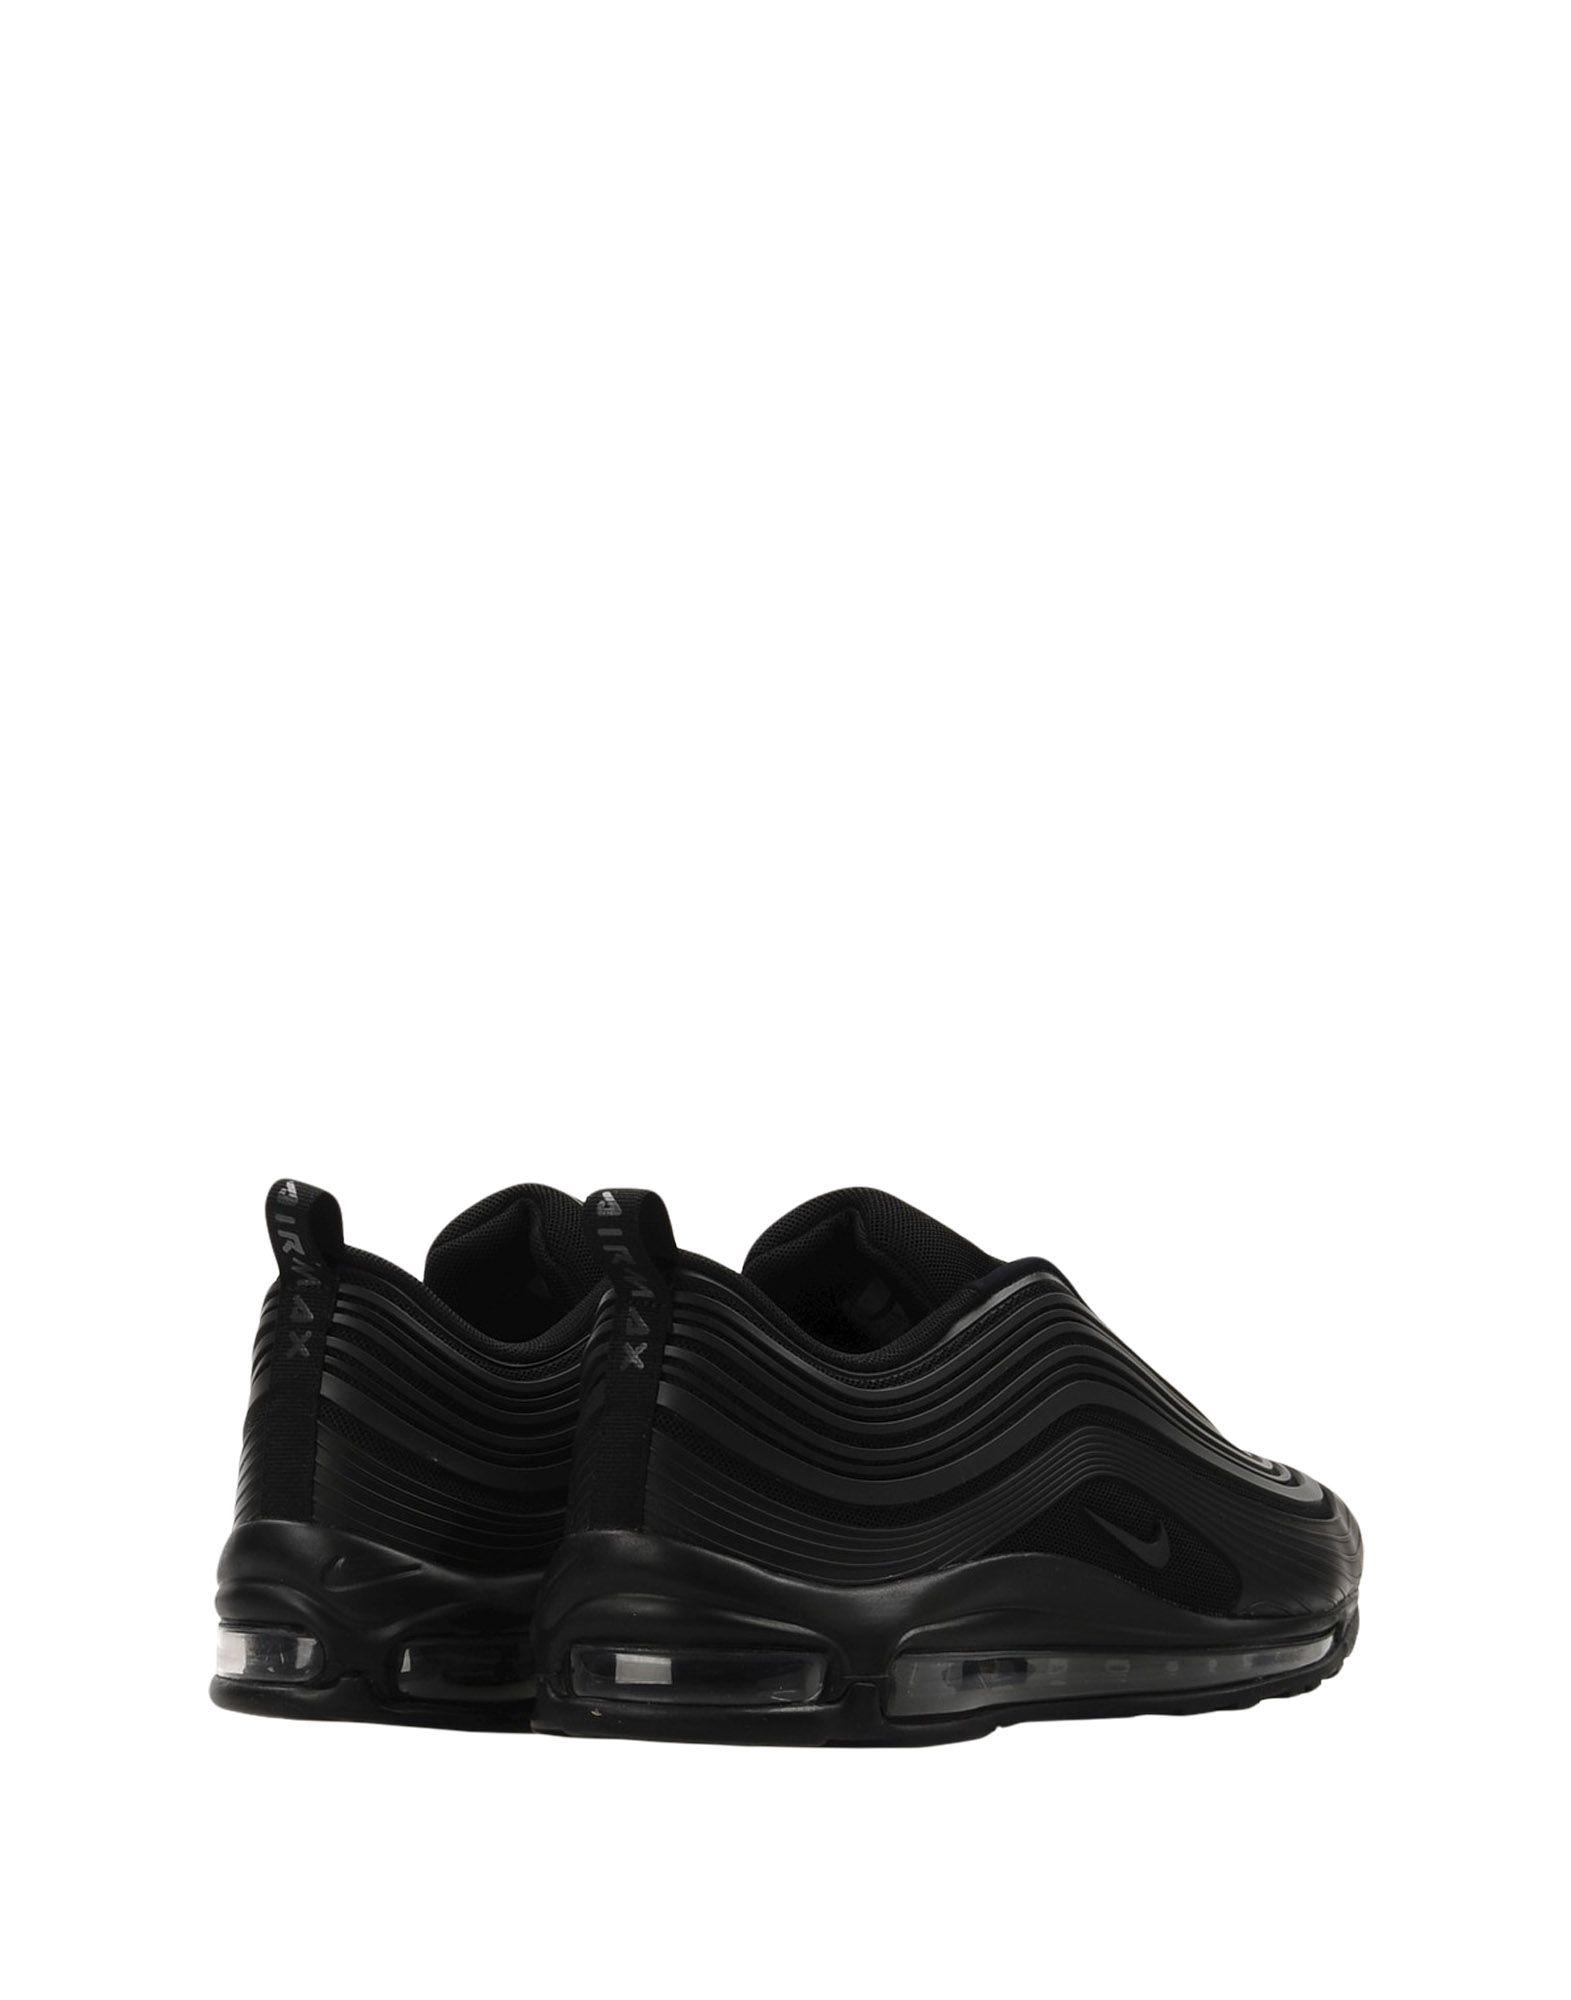 Nike Air Max Qualität 97 Ul'17 Premium  11445804RM Gute Qualität Max beliebte Schuhe f3fef7